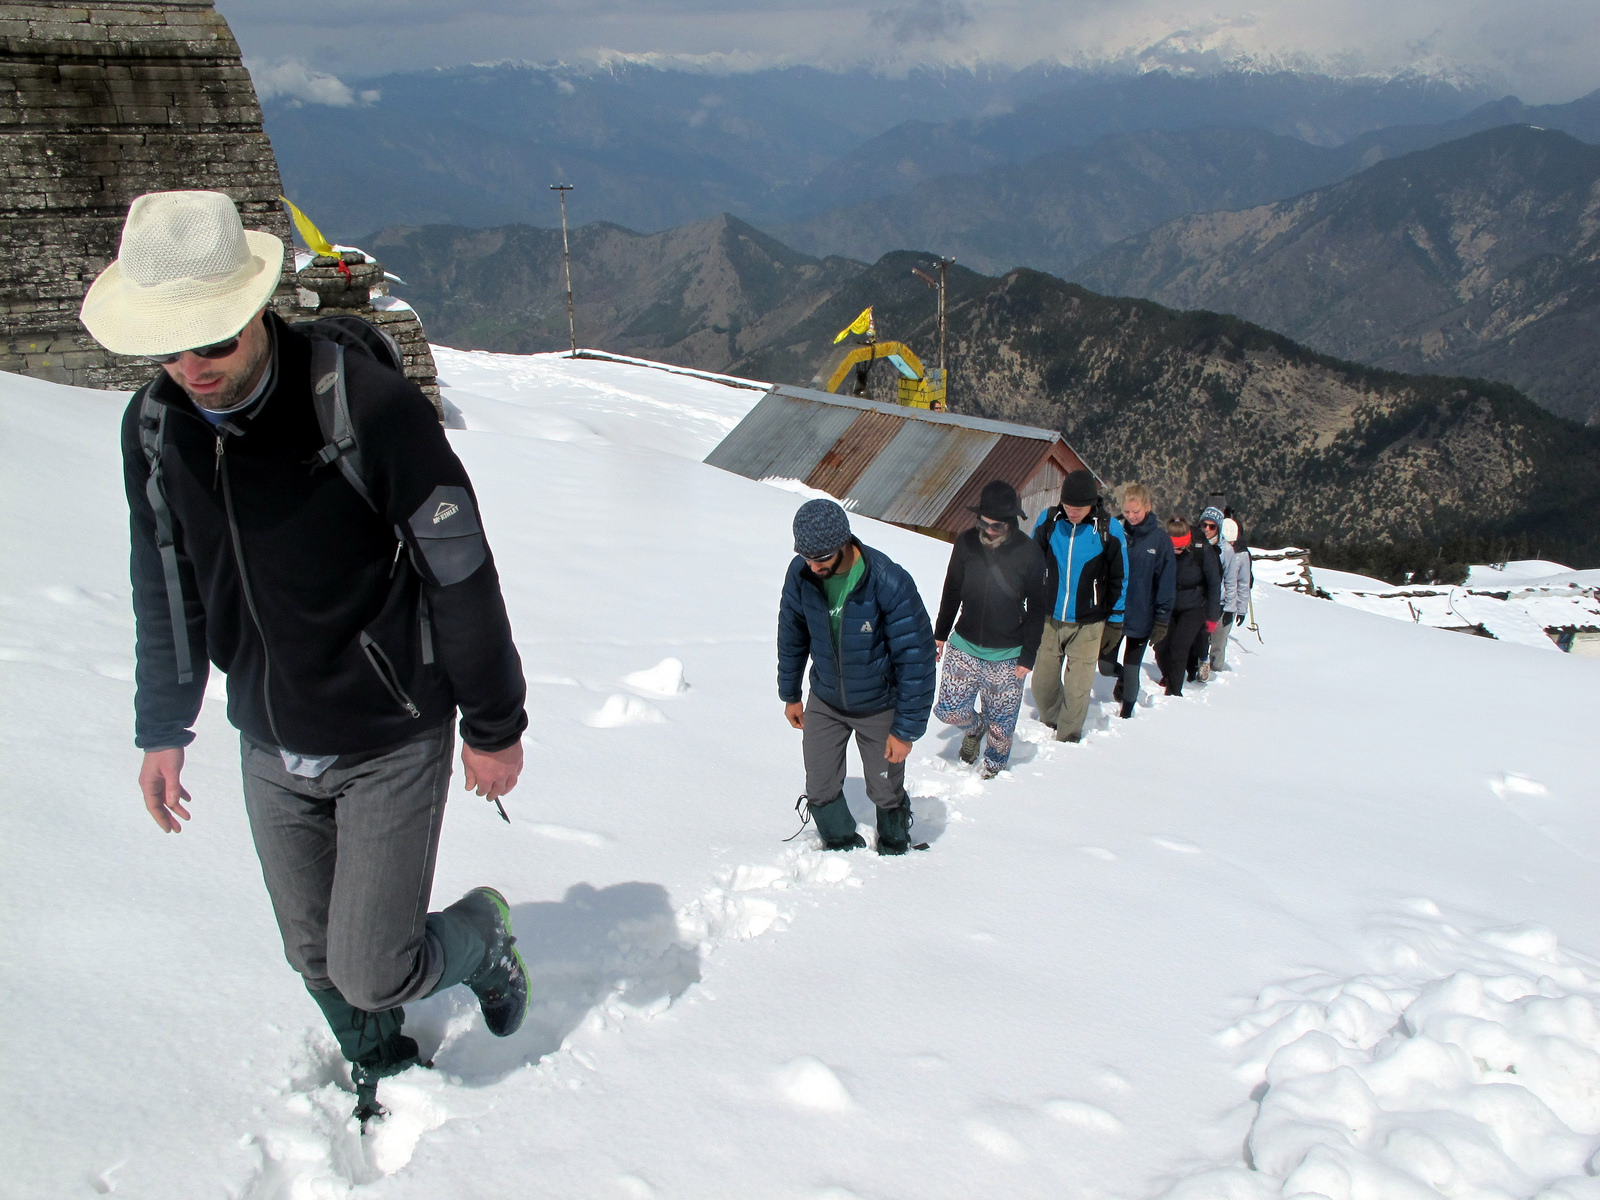 Winter Trekking in the Indian Himalayas